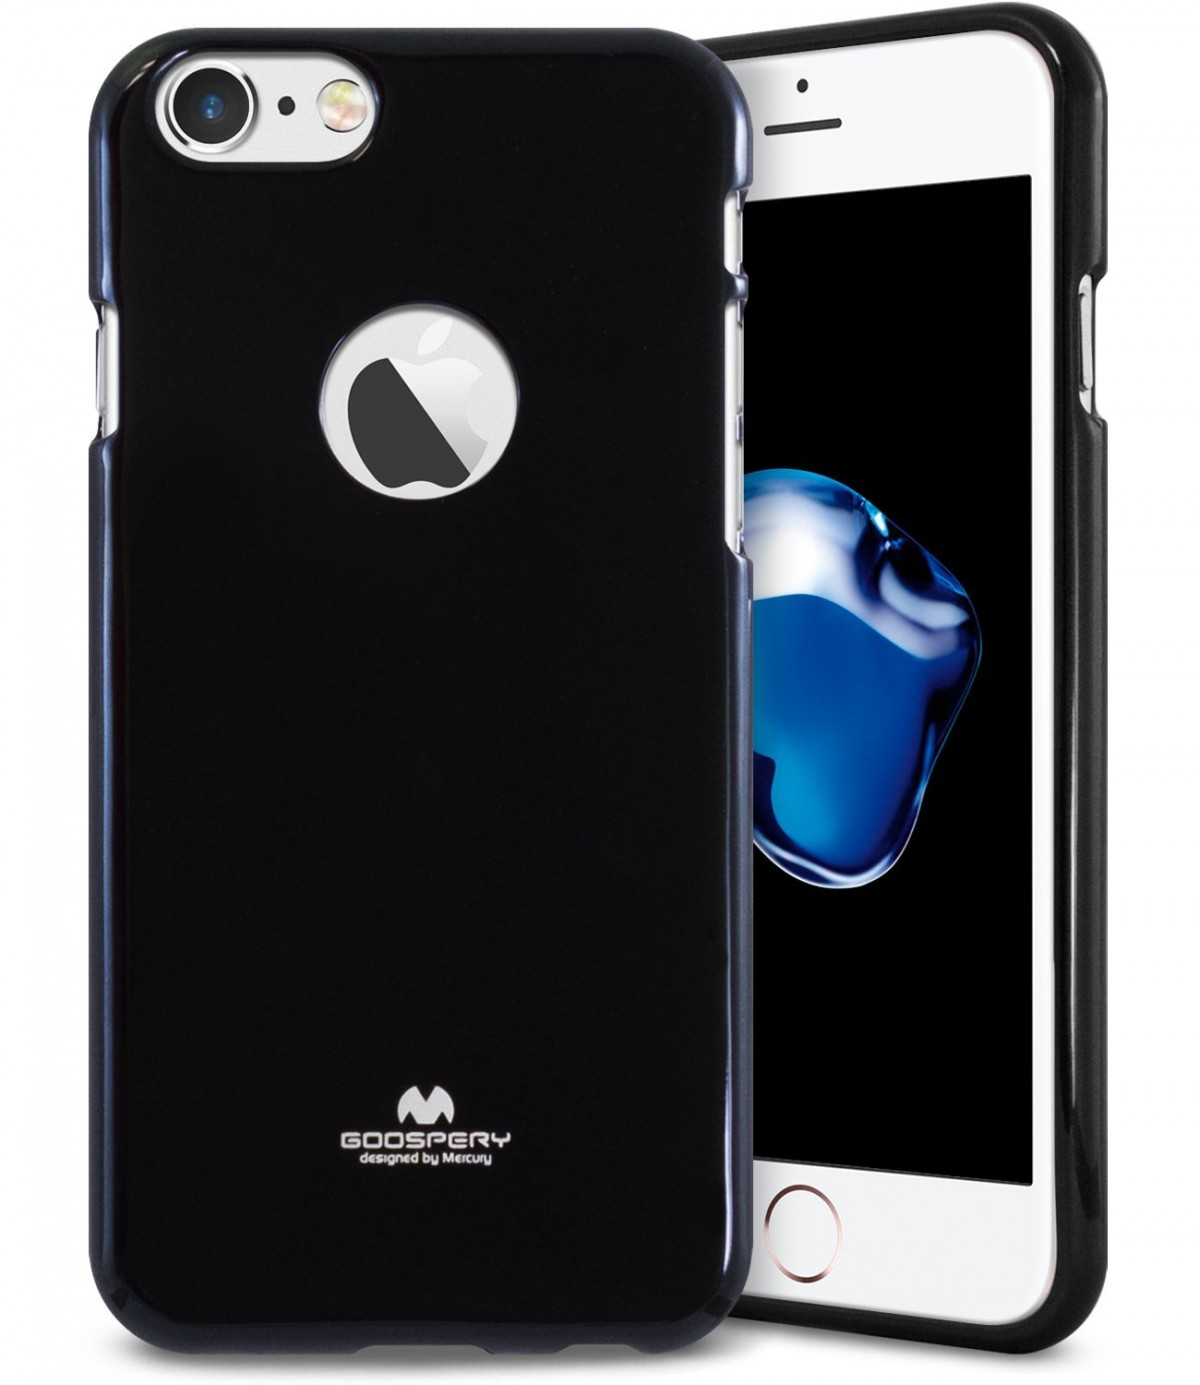 Tenké silikonové obaly / kryty Goospery Mercury pro Apple iPhone 7 - Černý / Jet Black